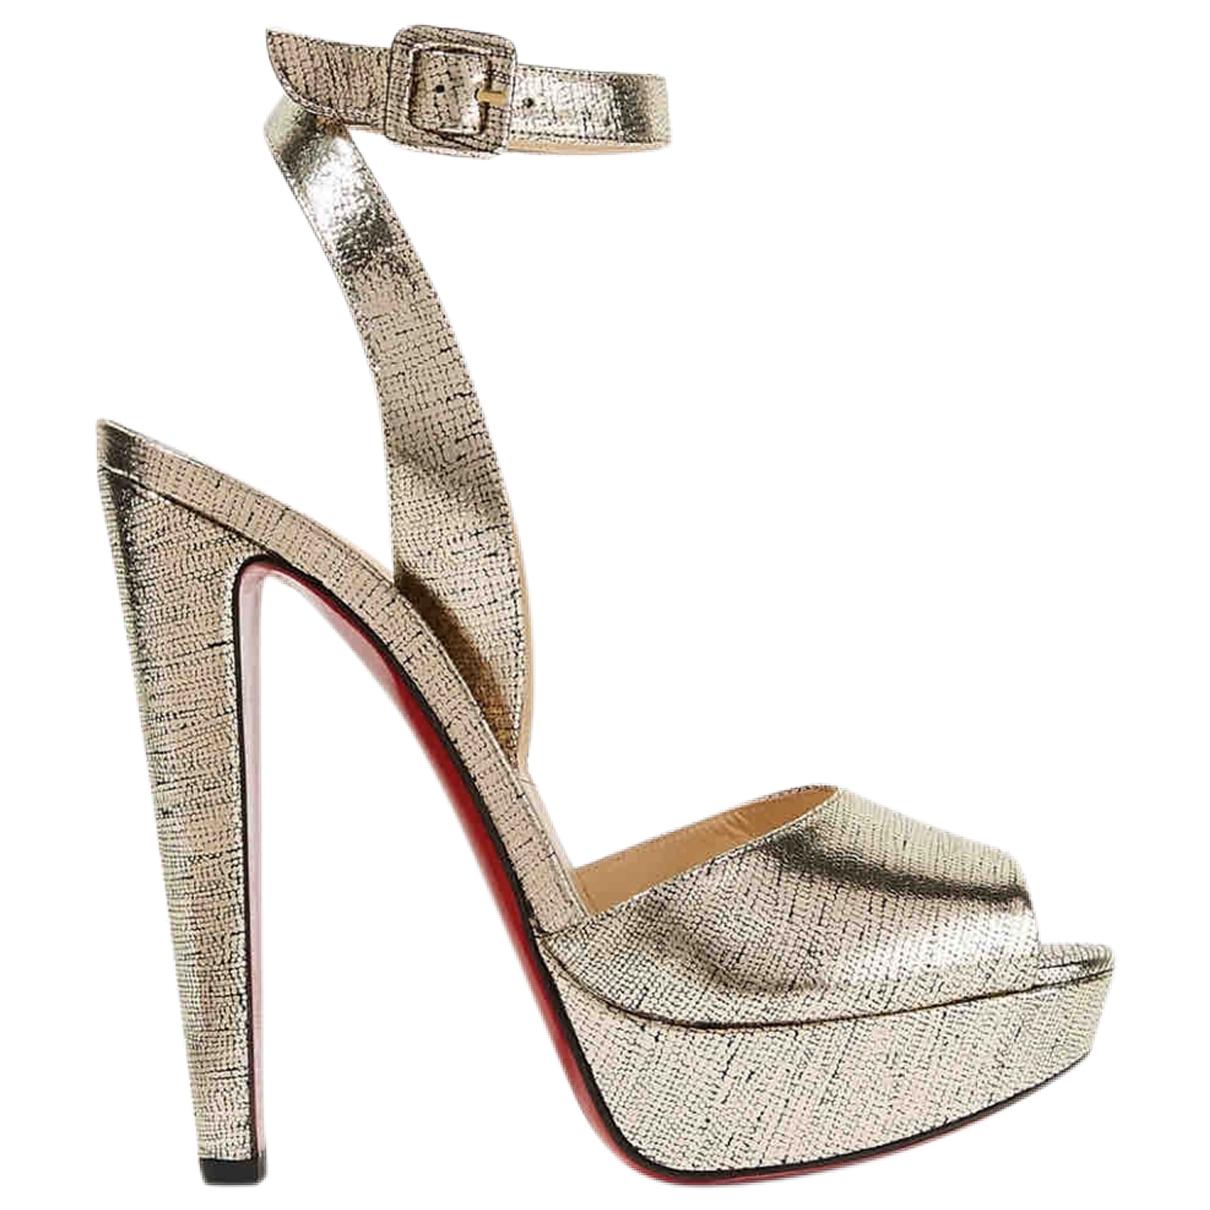 Christian Louboutin \N Metallic Leather Sandals for Women 37 EU